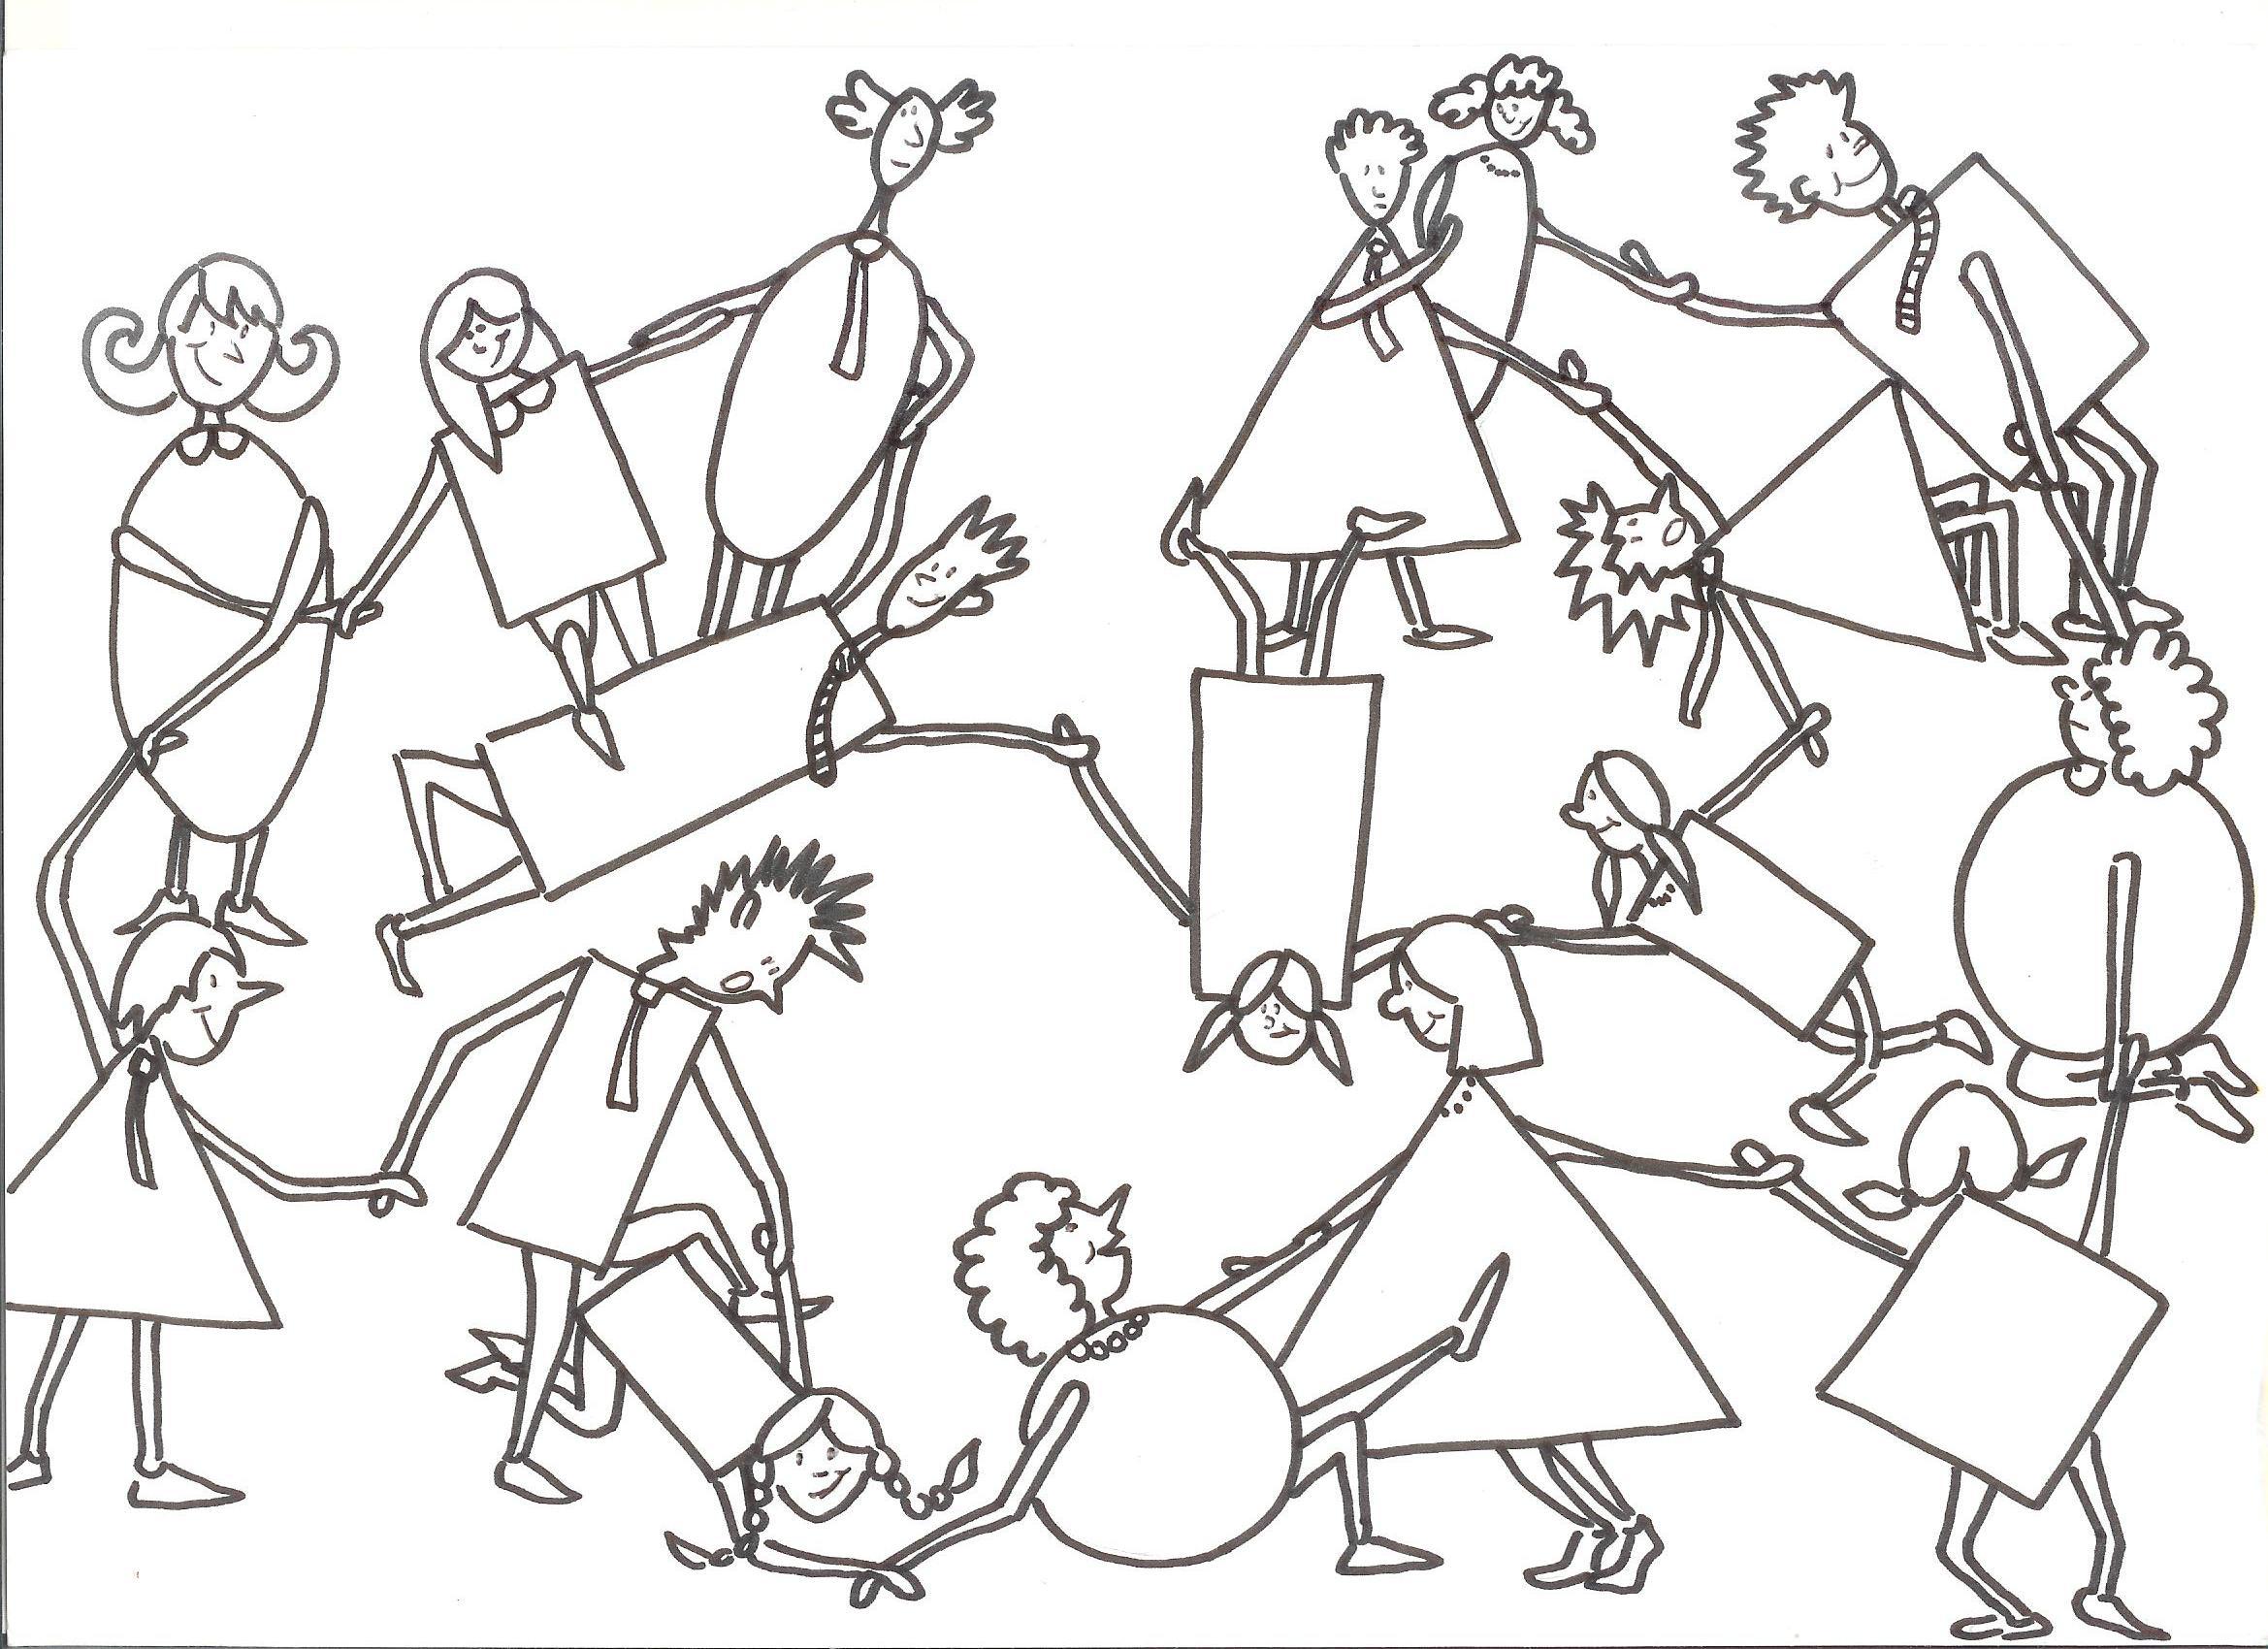 Illustration du jeu du nœud @Luana Reiser